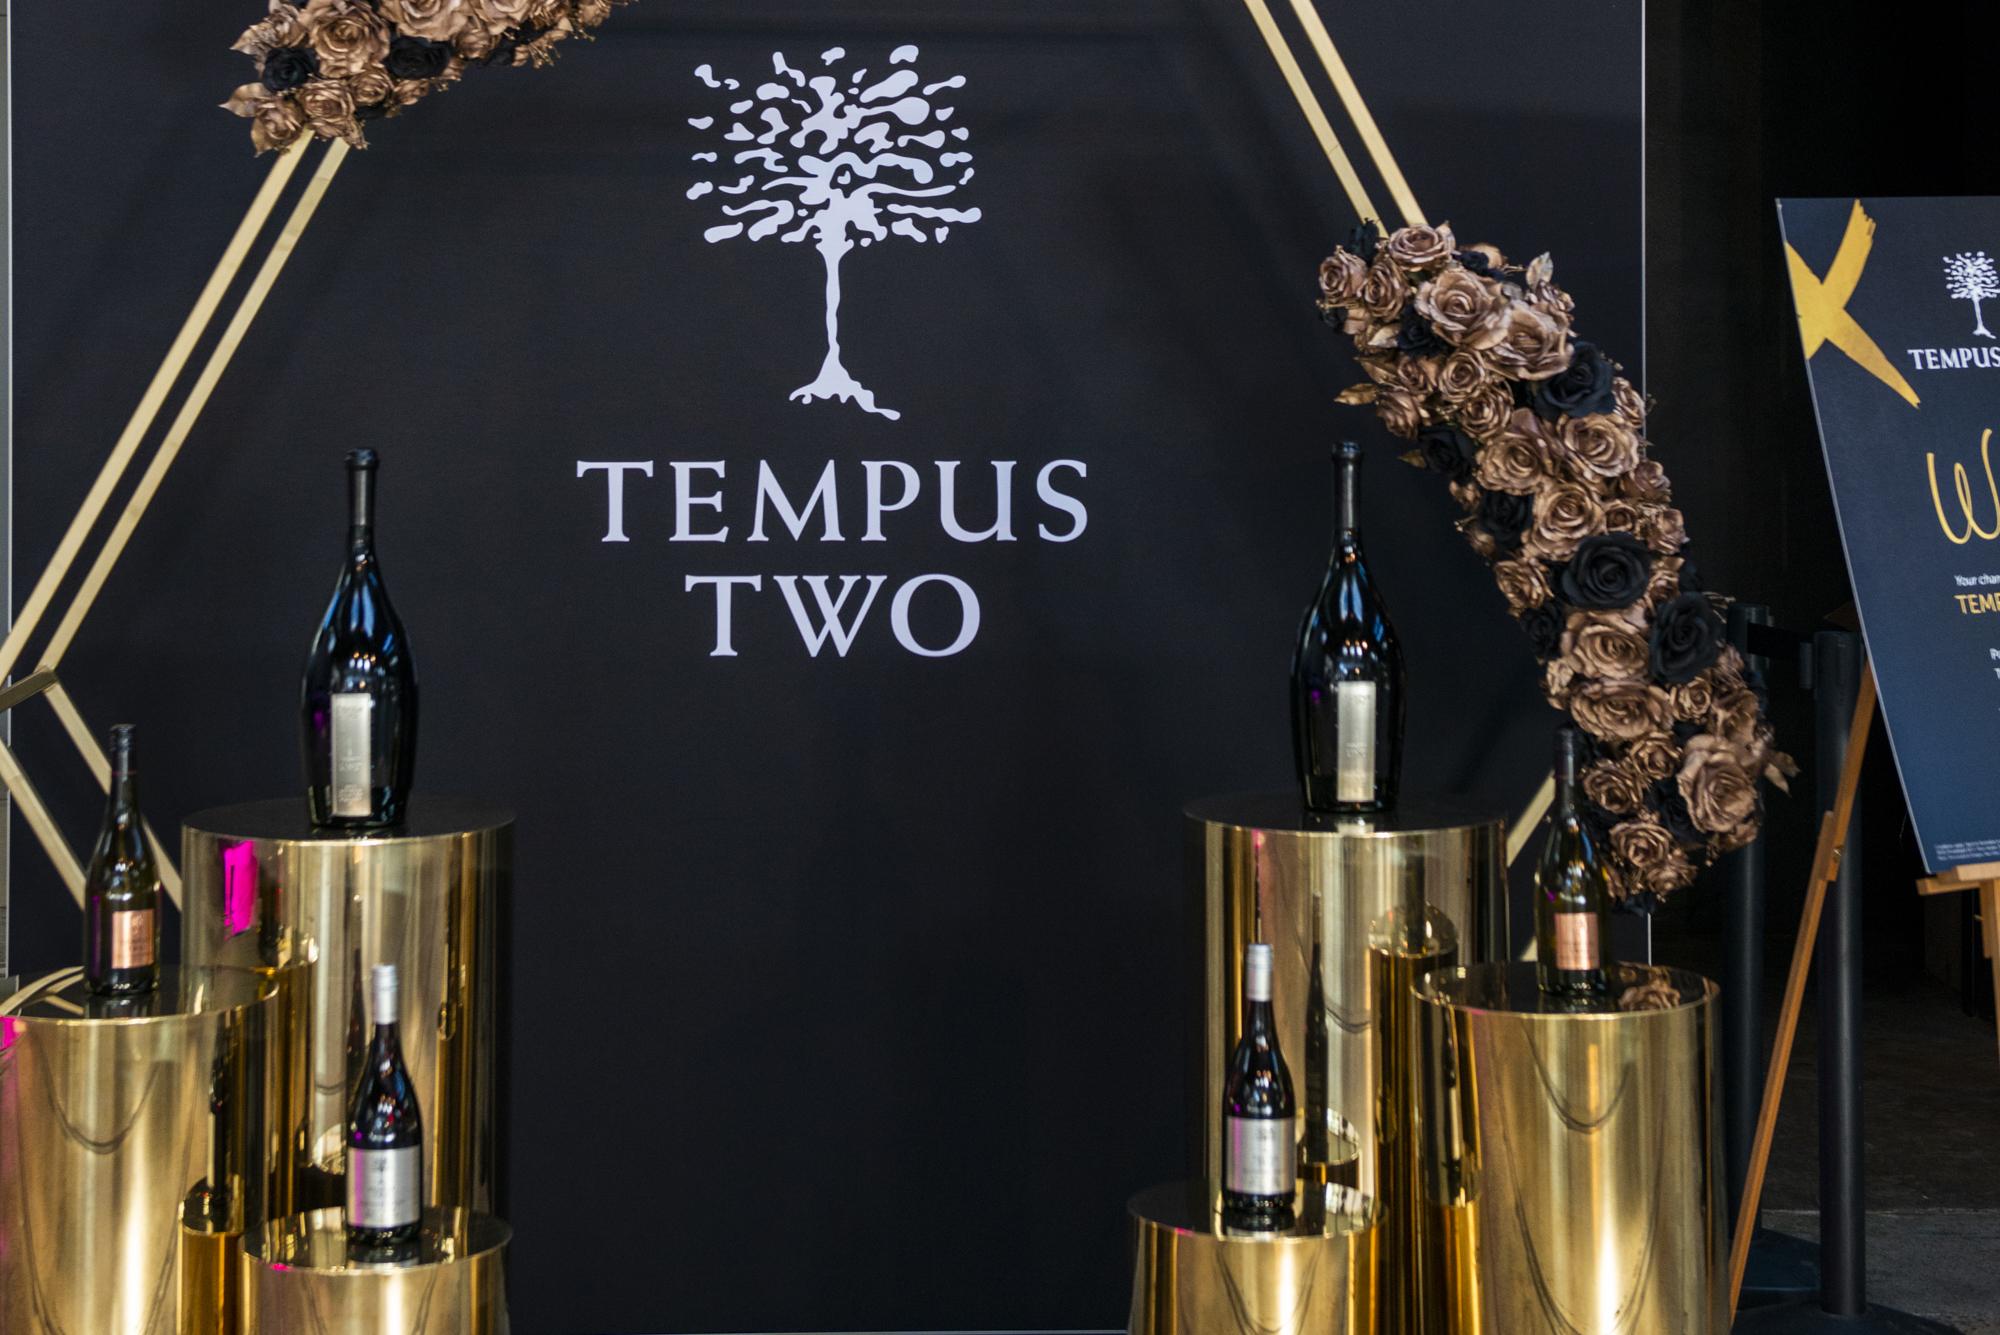 Tempus Two